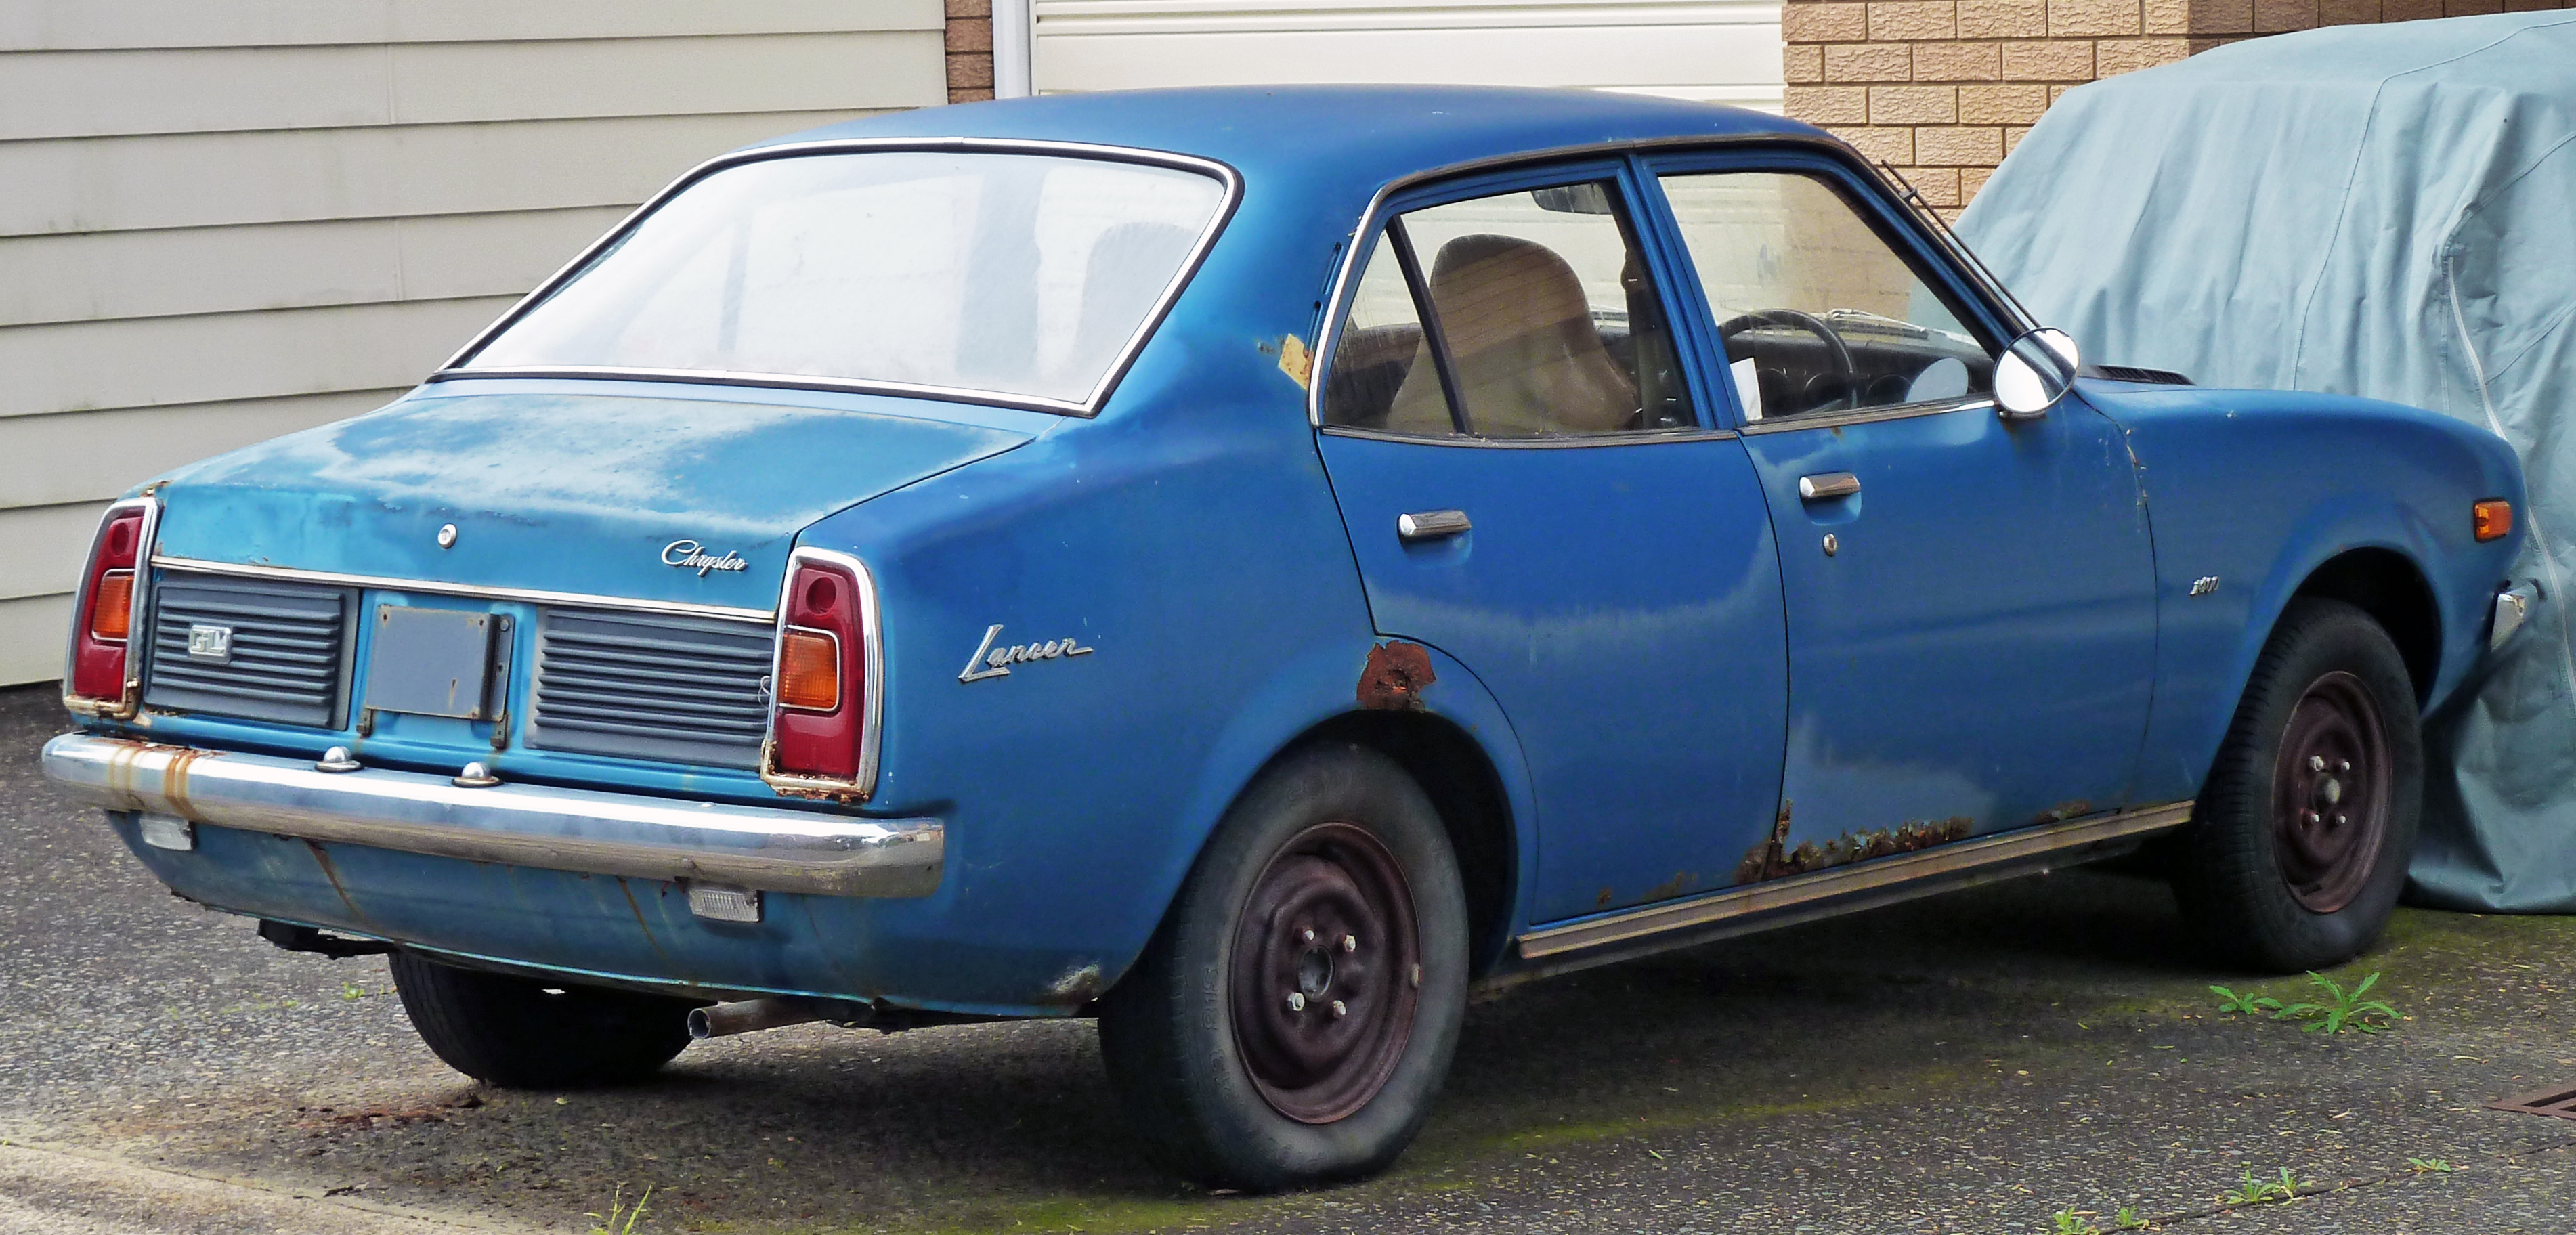 Mitsubishi Lancer I 1973 - 1985 Coupe #1